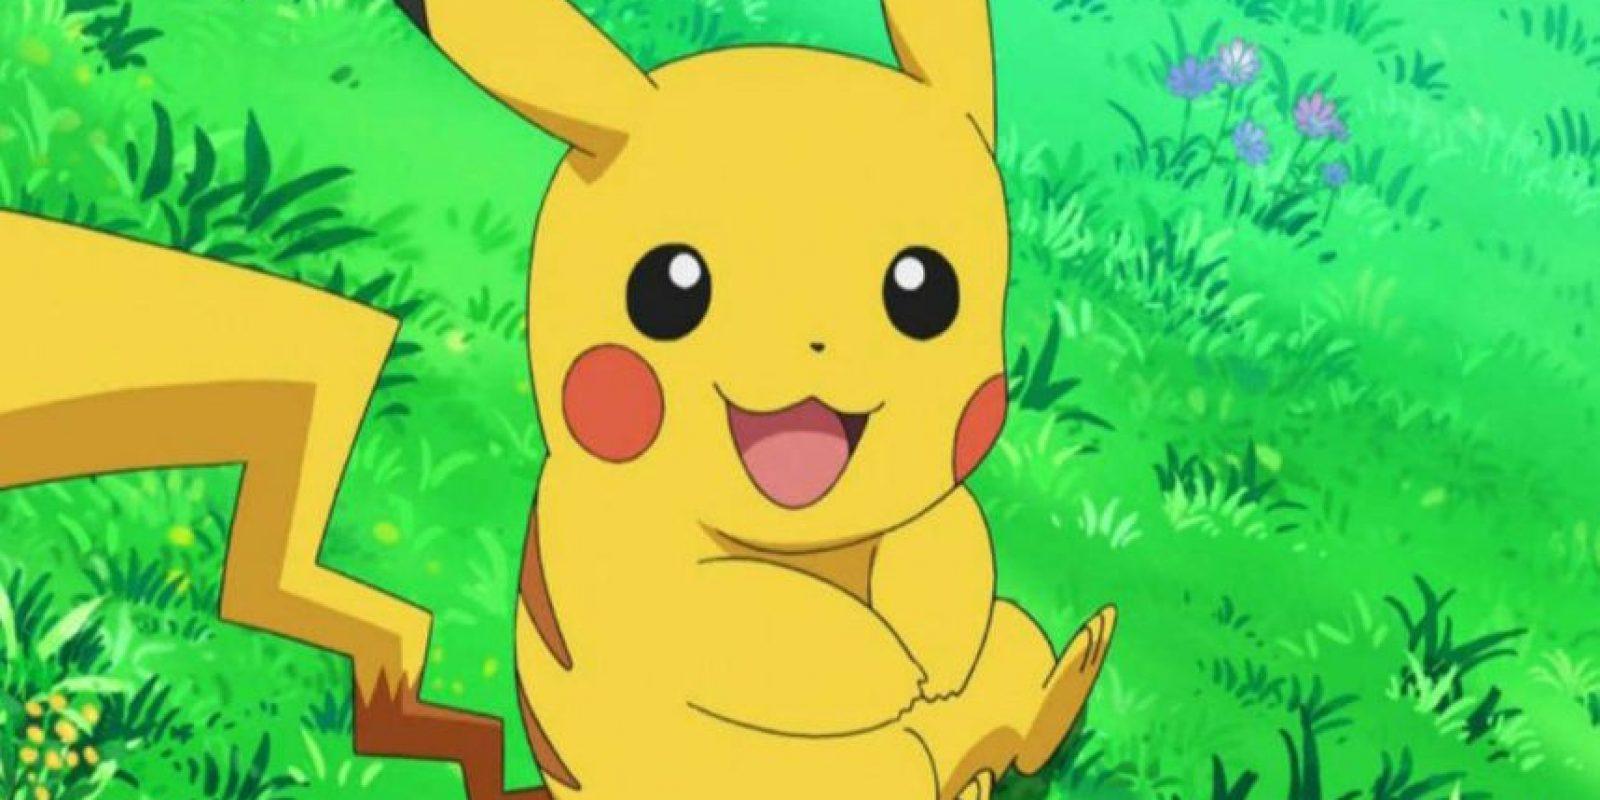 Pikachu es el pokémon más popular. Foto:Pokémon